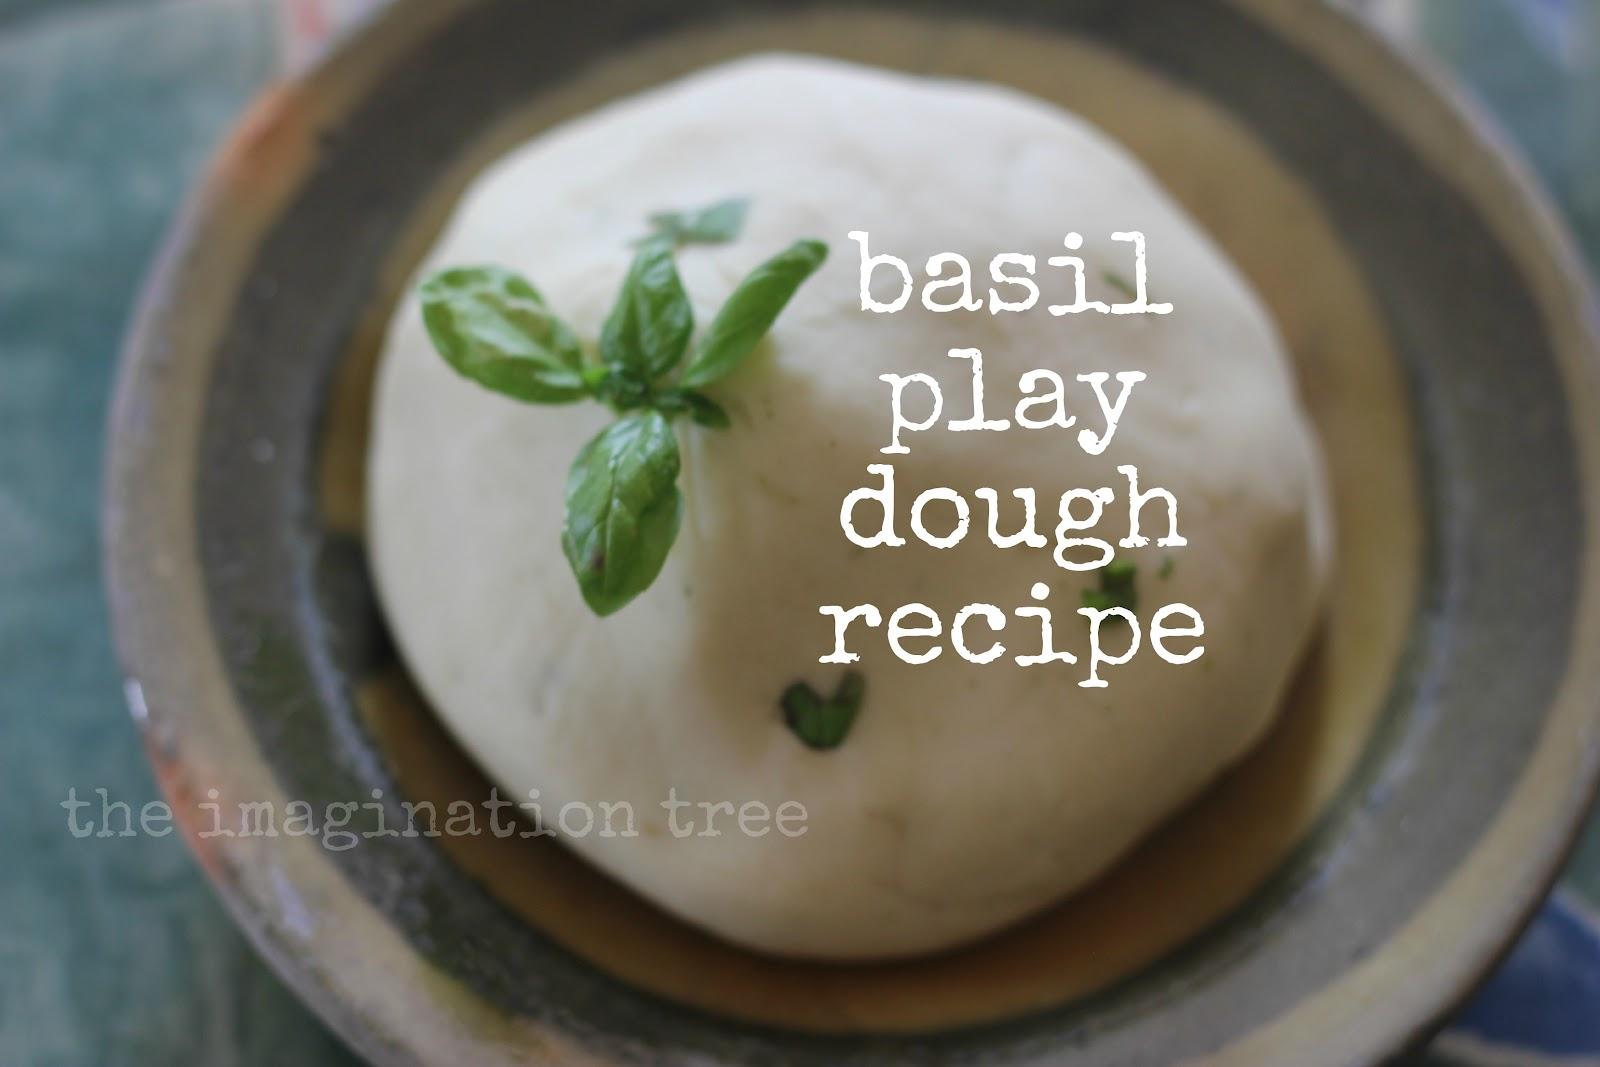 Natural Play Dough Recipe No-cook Play Dough Recipes